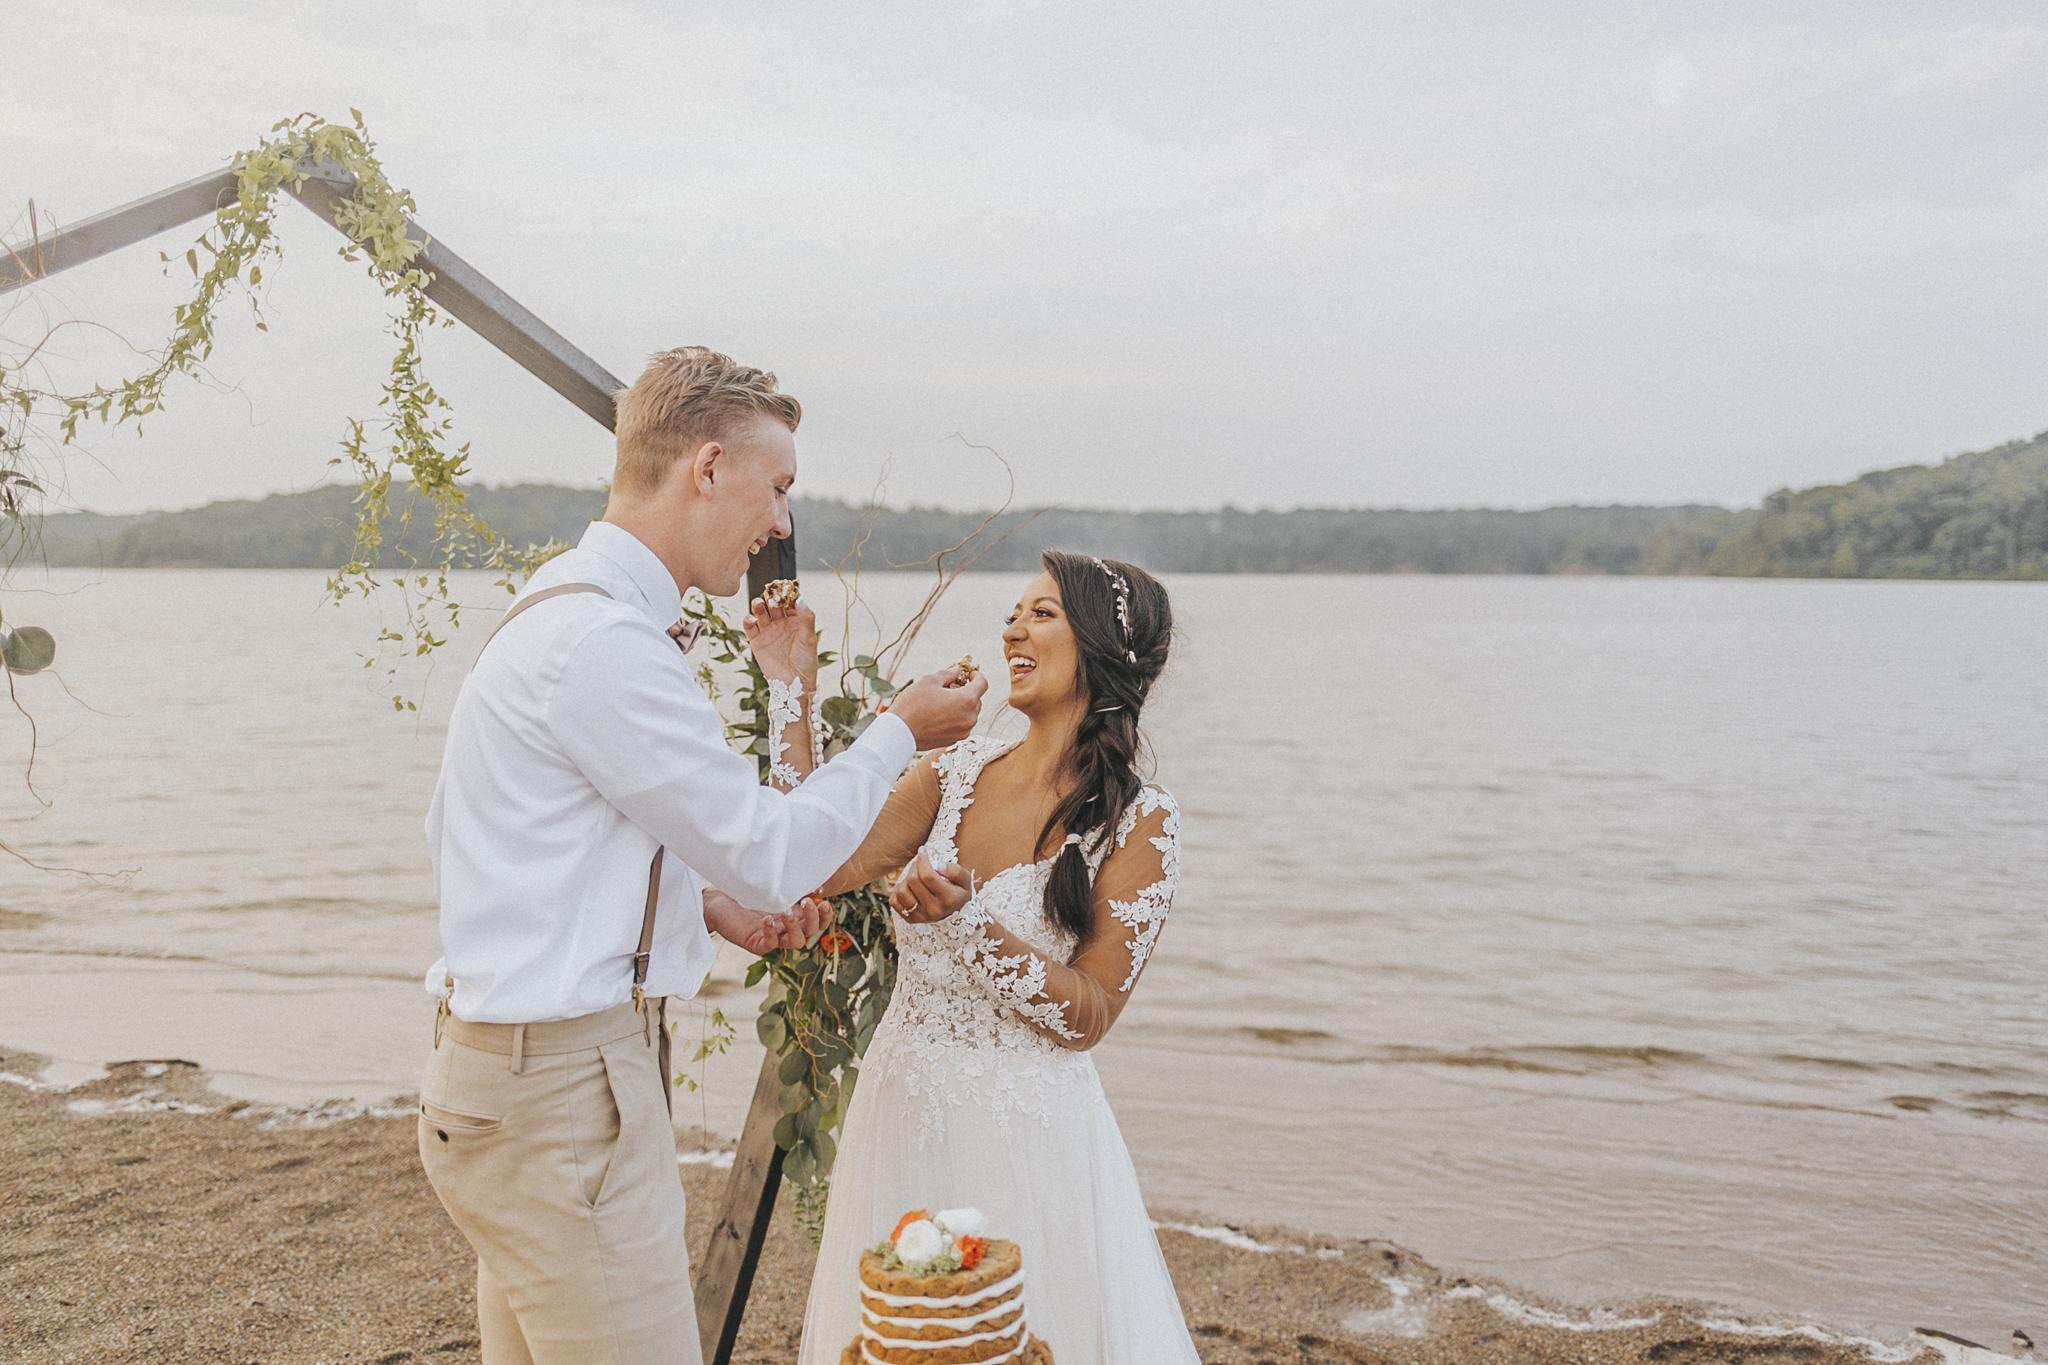 East Fork Lake Boho Elopement by Bare Moments Photography // cincinnati wedding photography